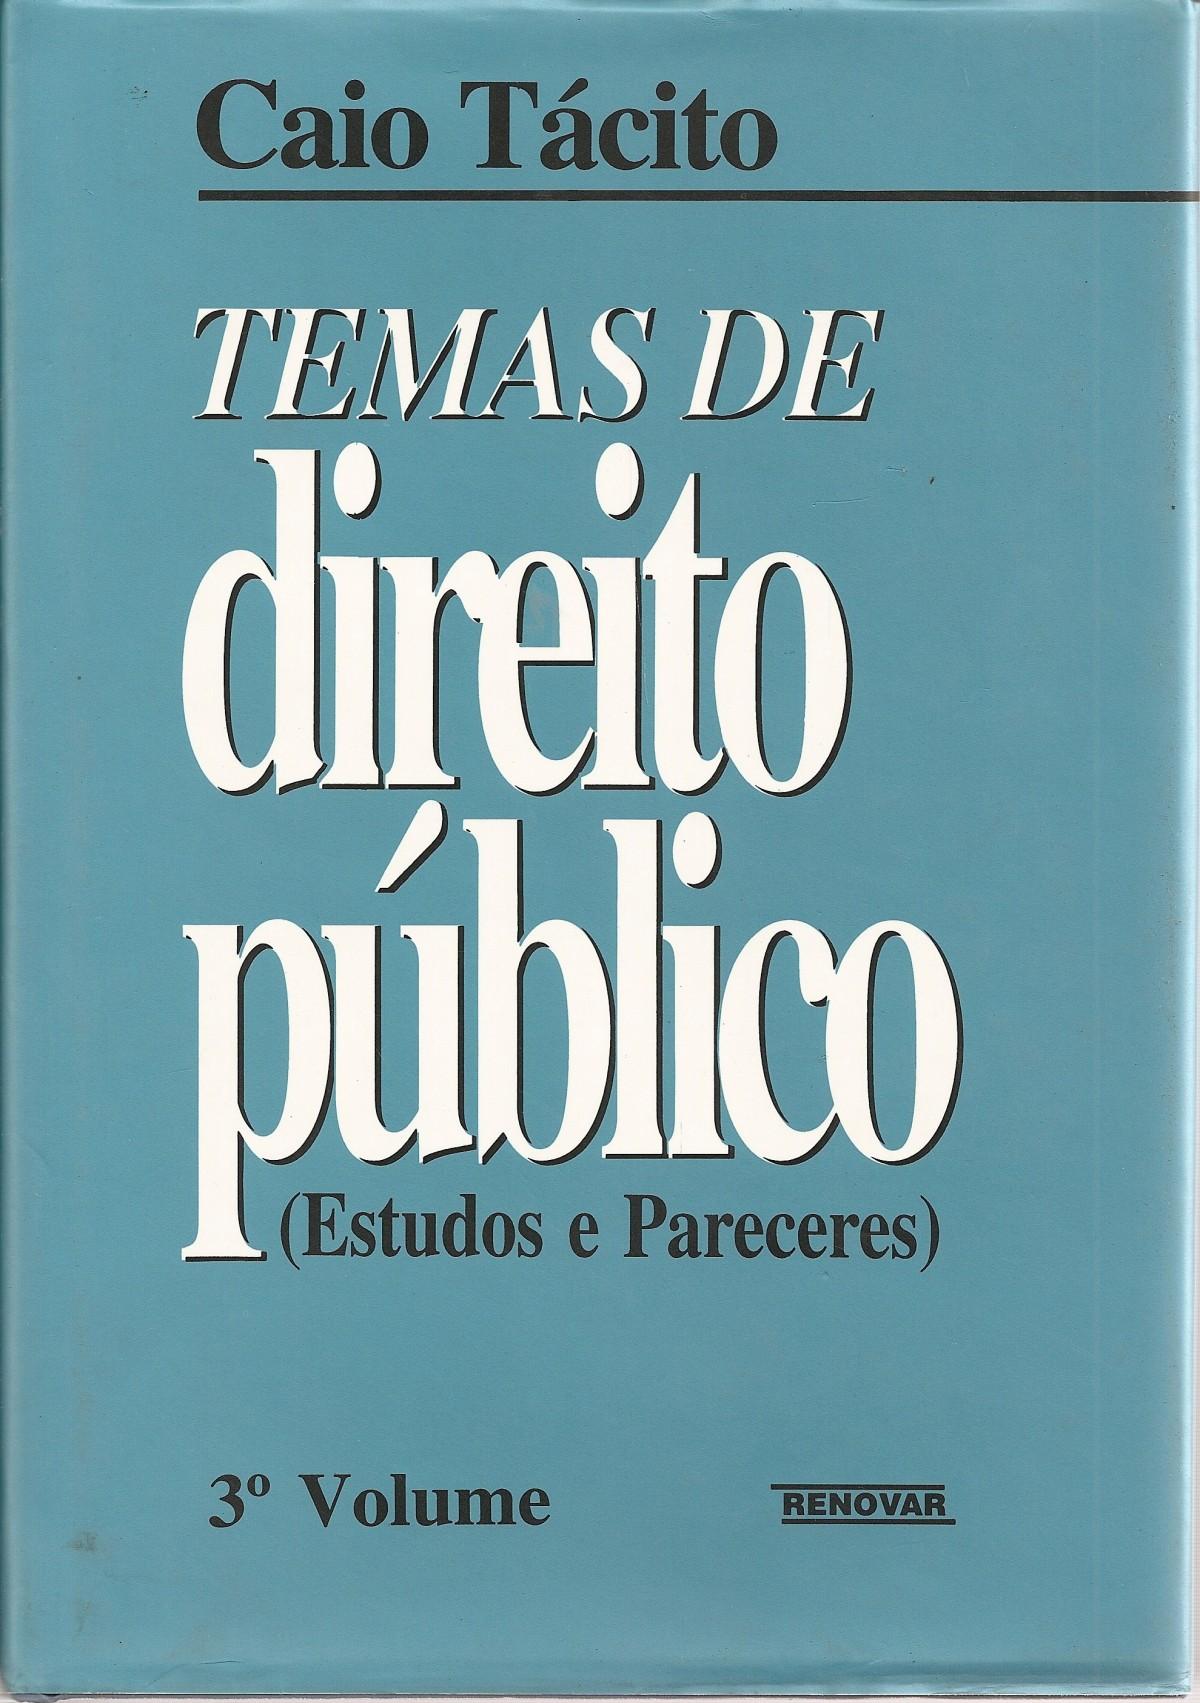 Foto 1 - Temas de Direito Público - Volume III